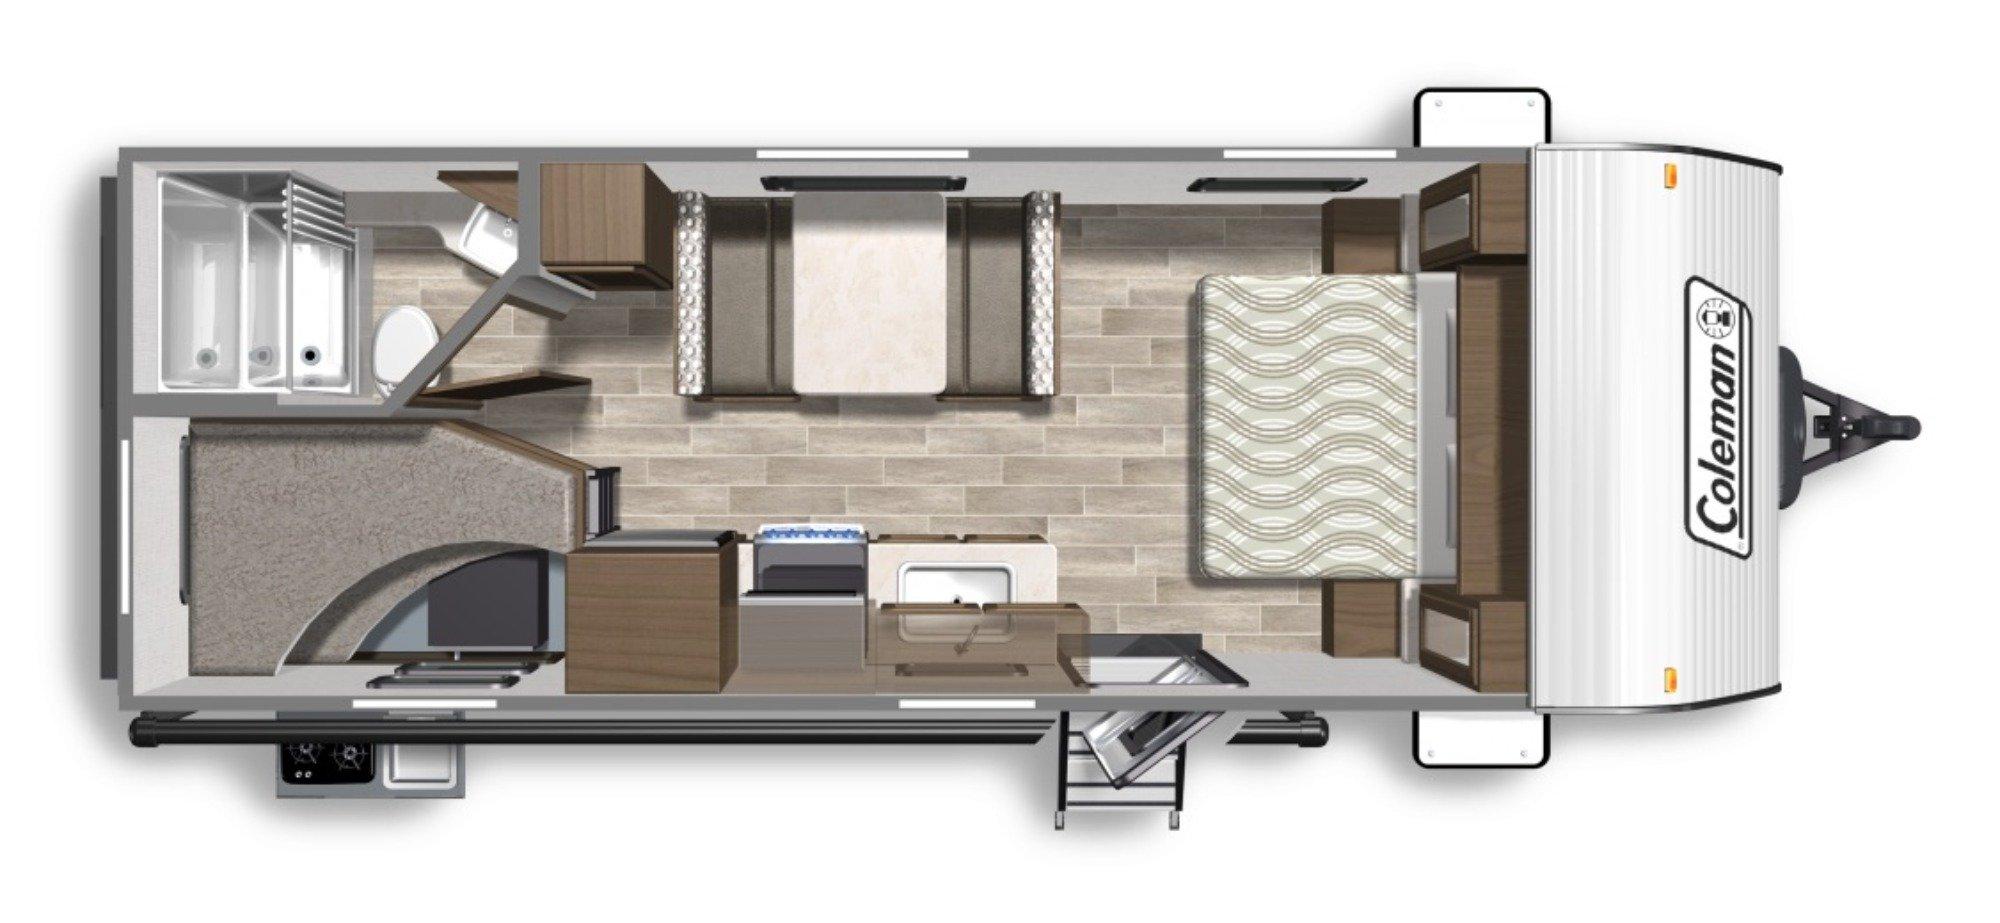 View Floor Plan for 2020 COLEMAN COLEMAN LANTERN LT 215BH